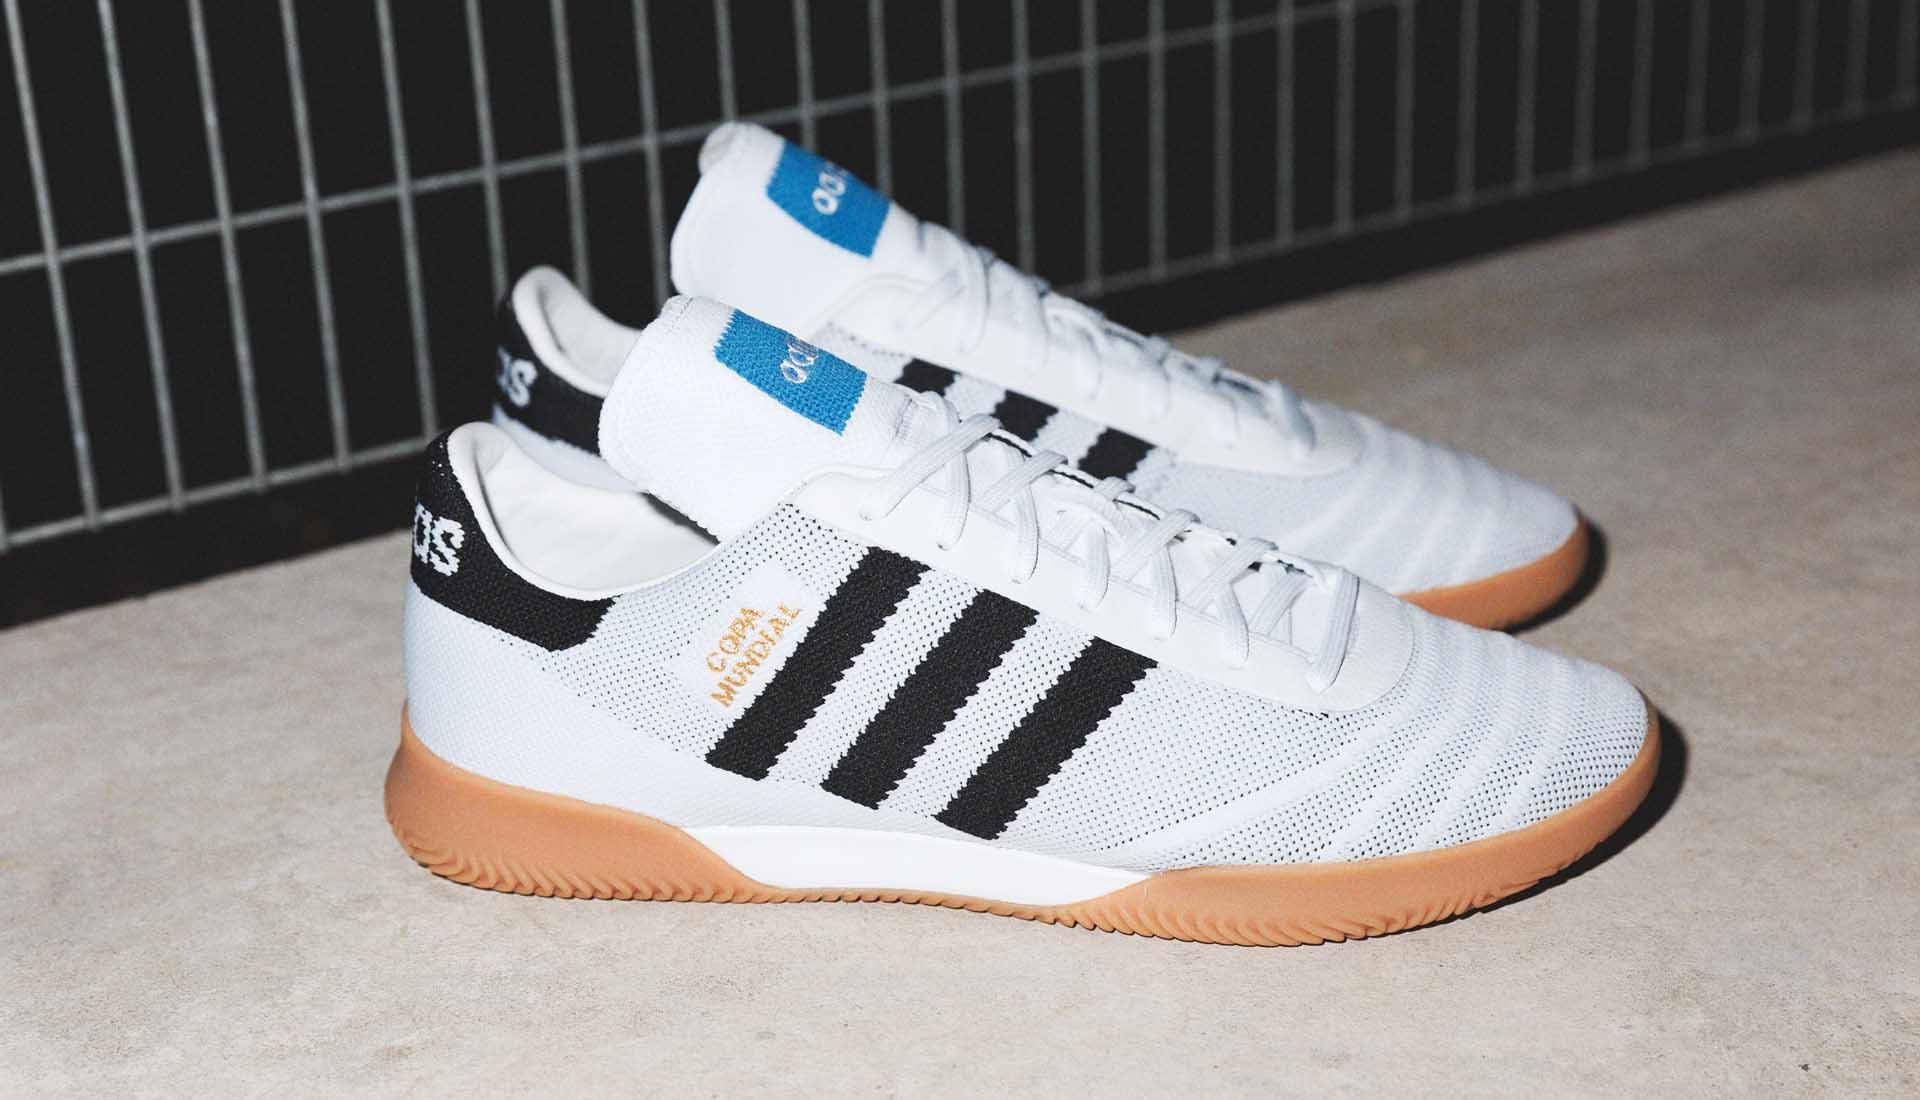 detailed look 79cbd a9da0 8-adidas-copa-70-sneakers-min.jpg